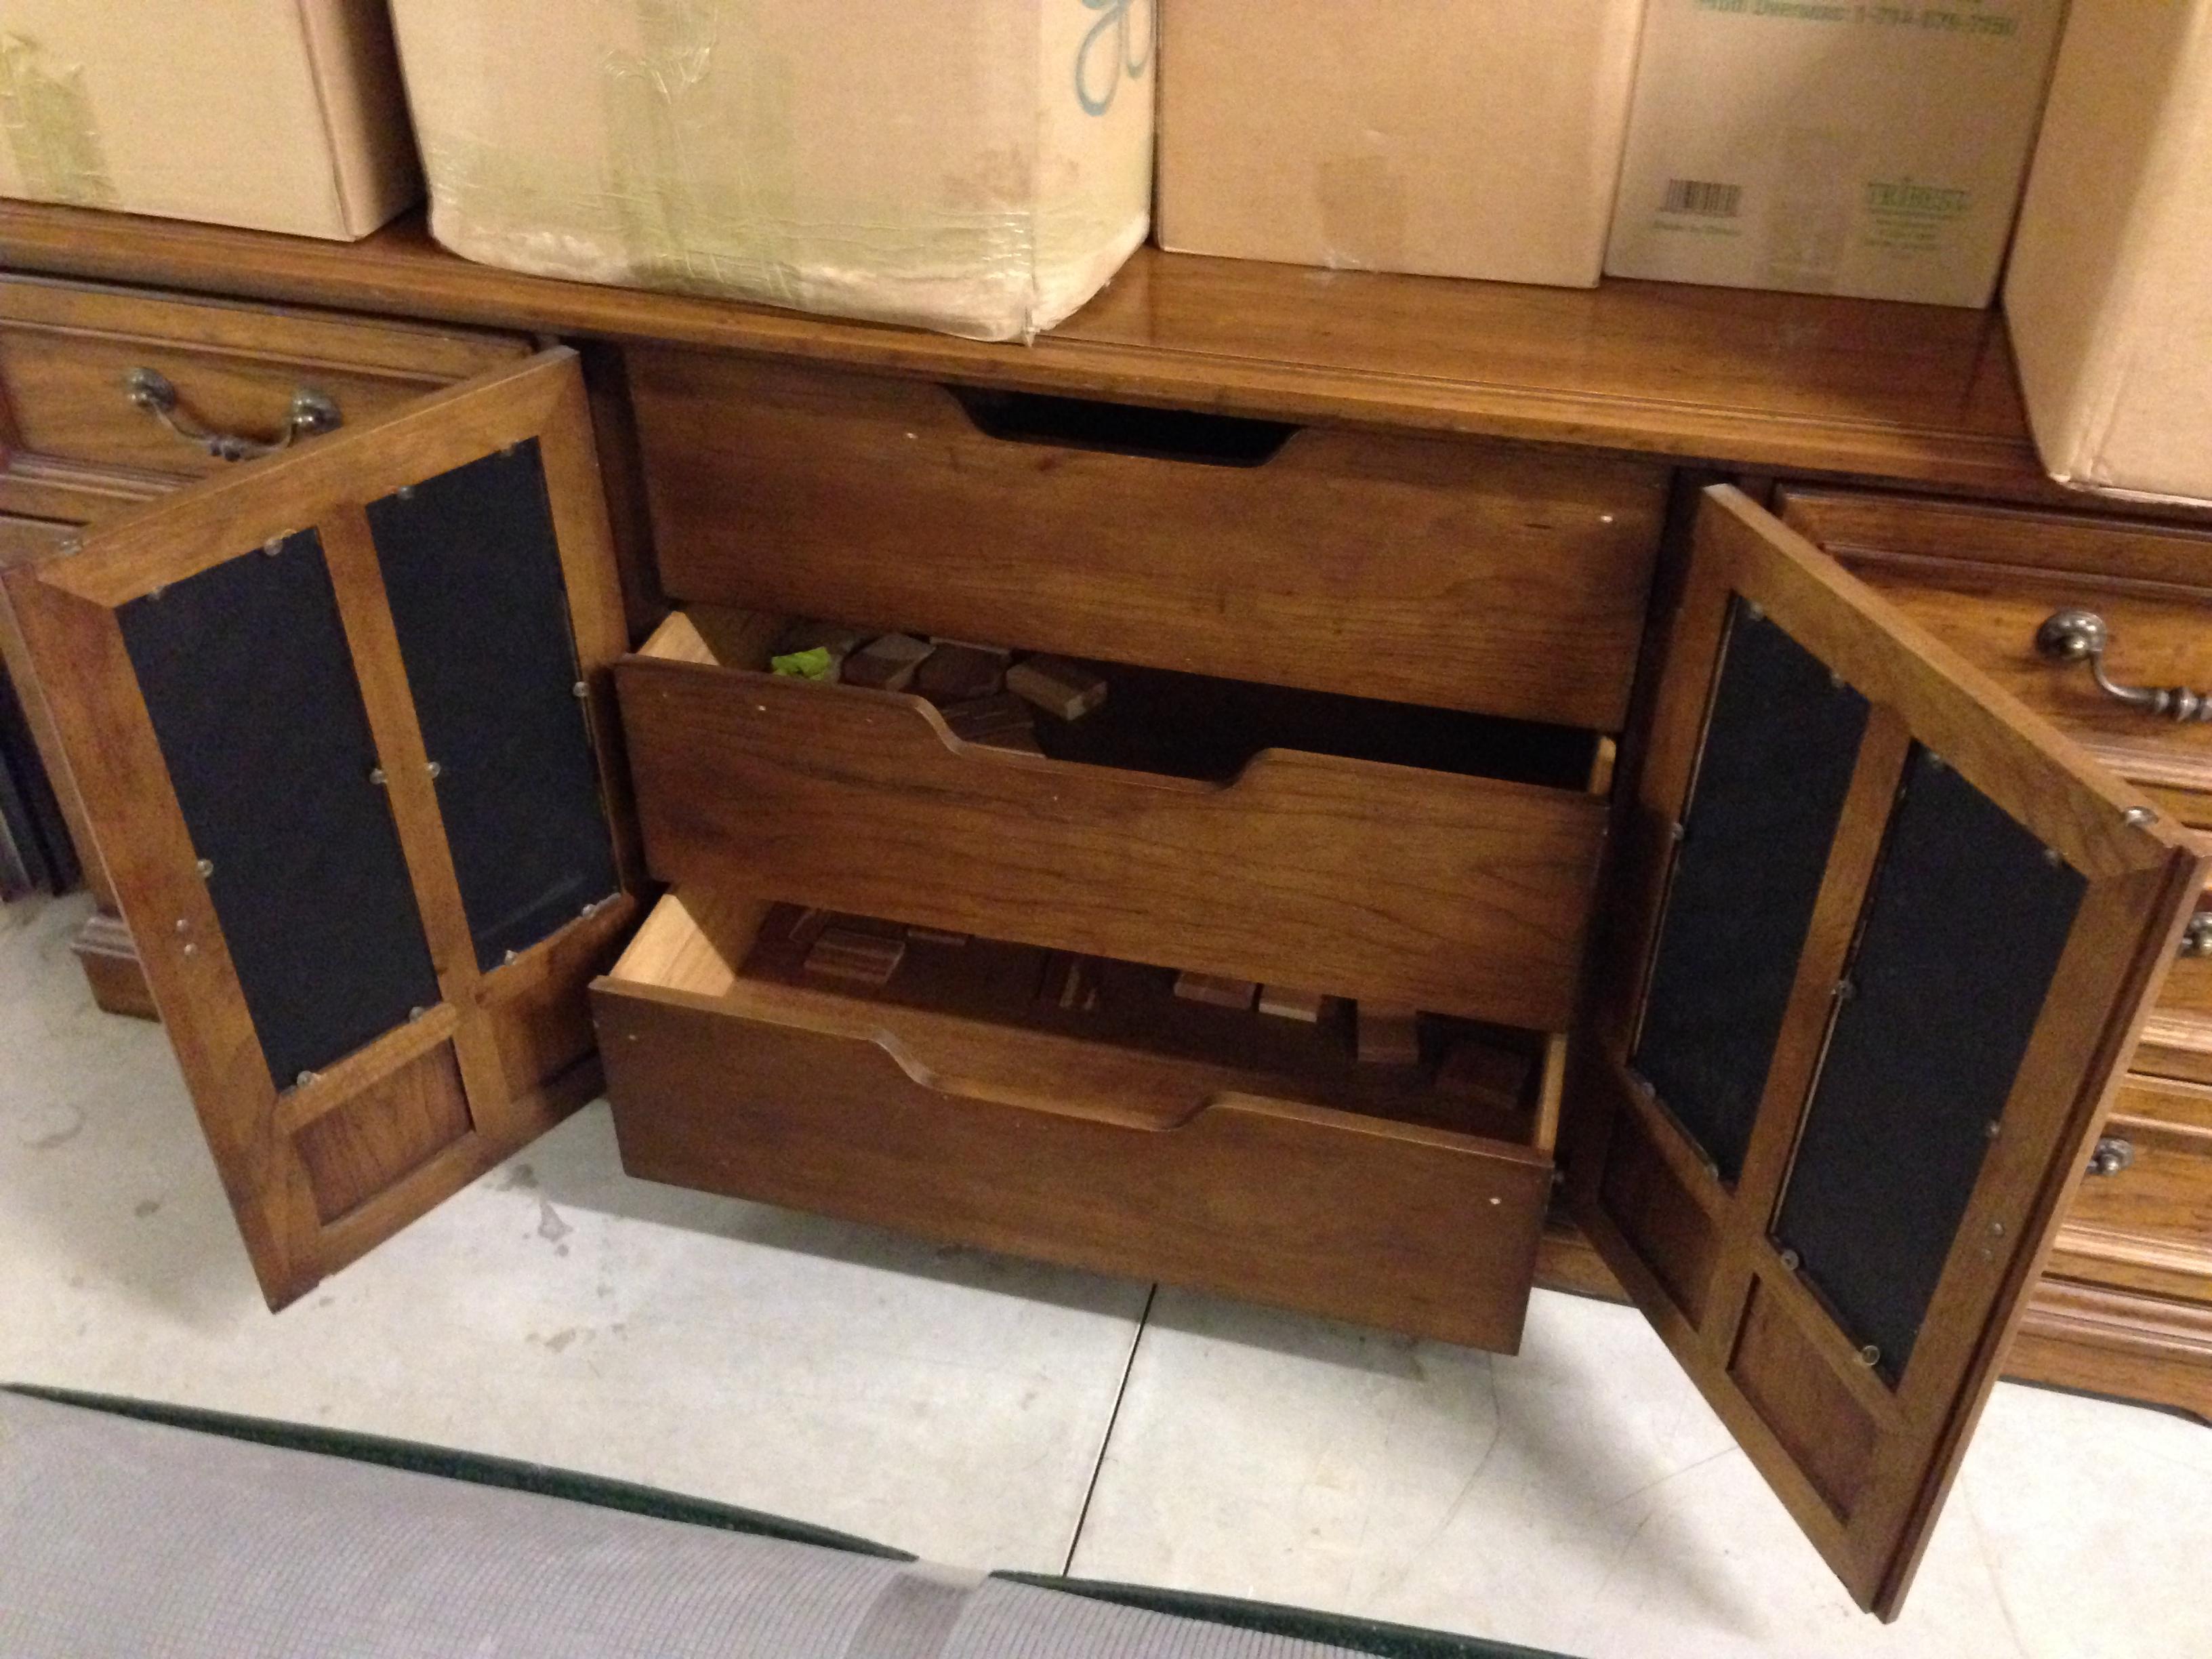 vintage drexel heritage furniture Drexel Heritage Bureau and Chest of Drawers antique appraisal  vintage drexel heritage furniture